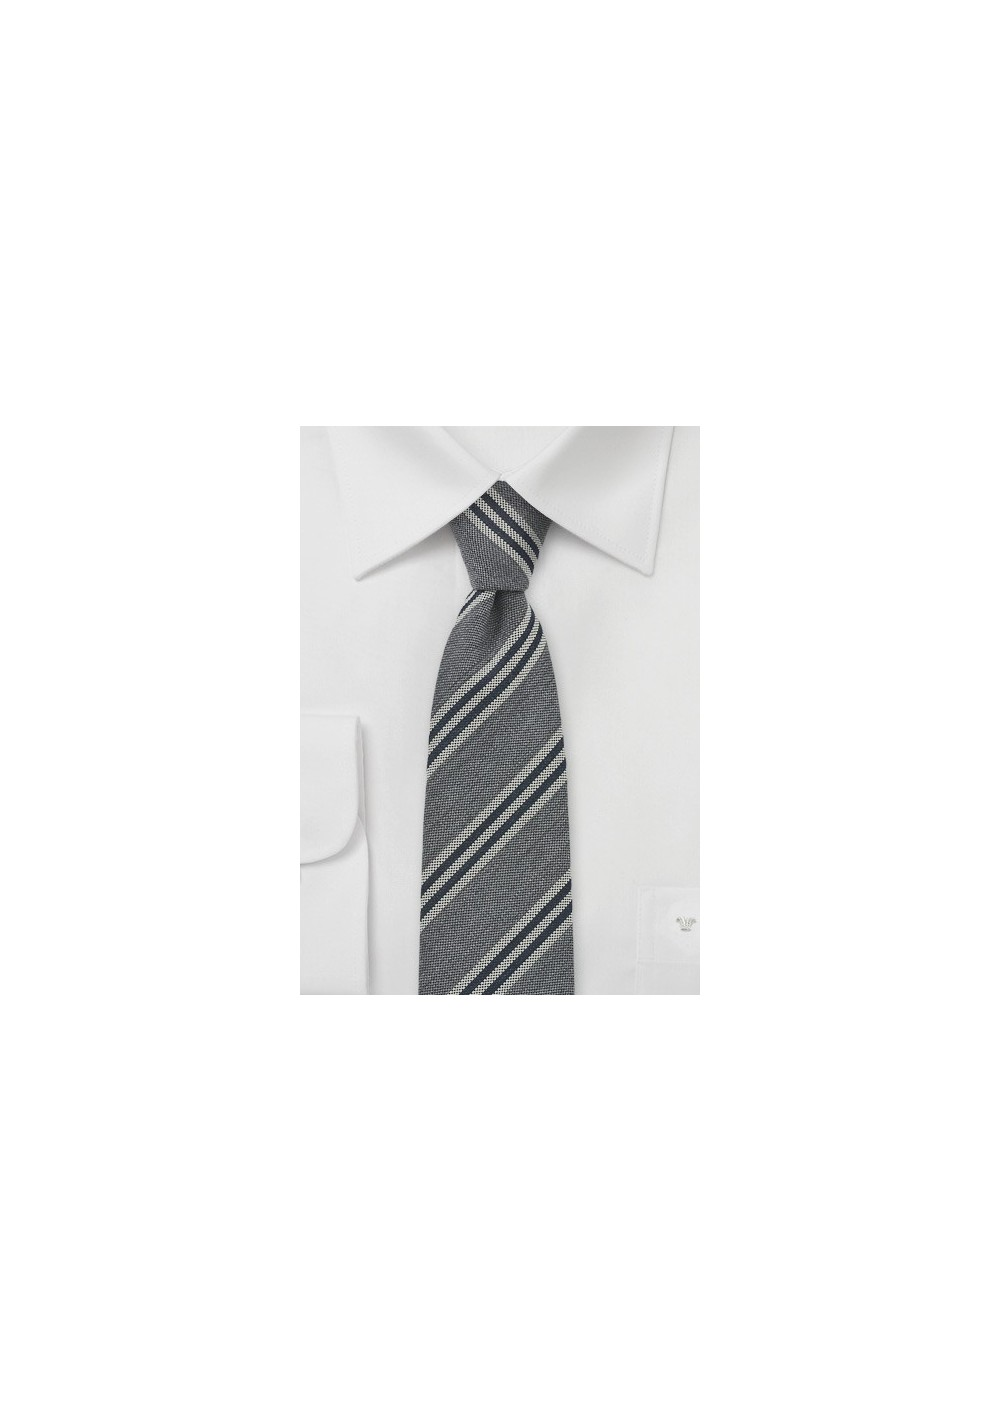 Skinny Striped Tie in Grays and Black